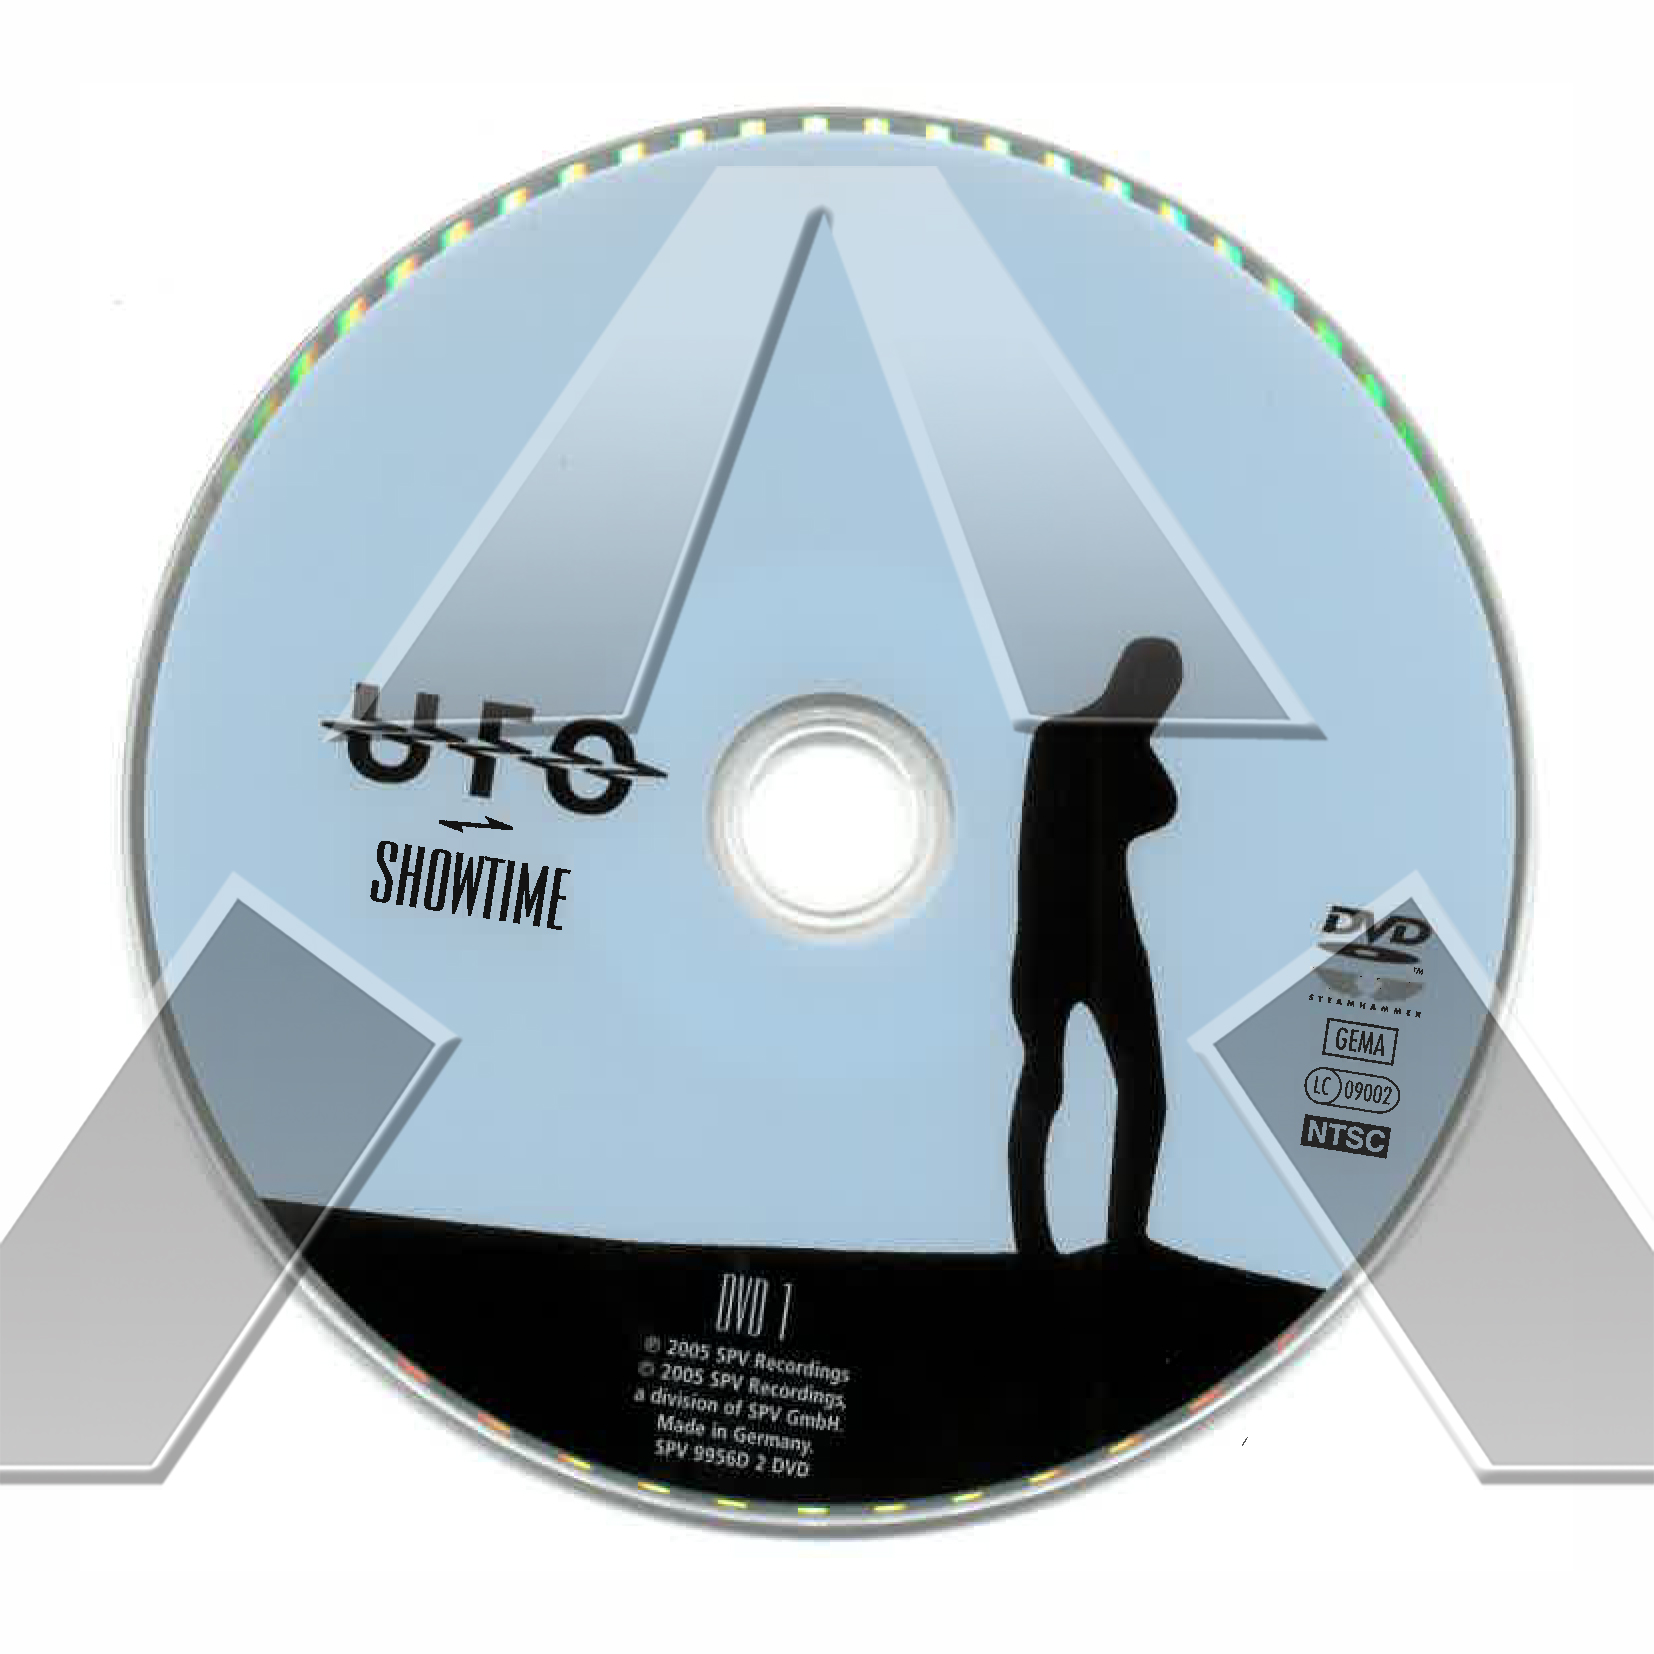 UFO ★ Showtime (dvd EU 99568)